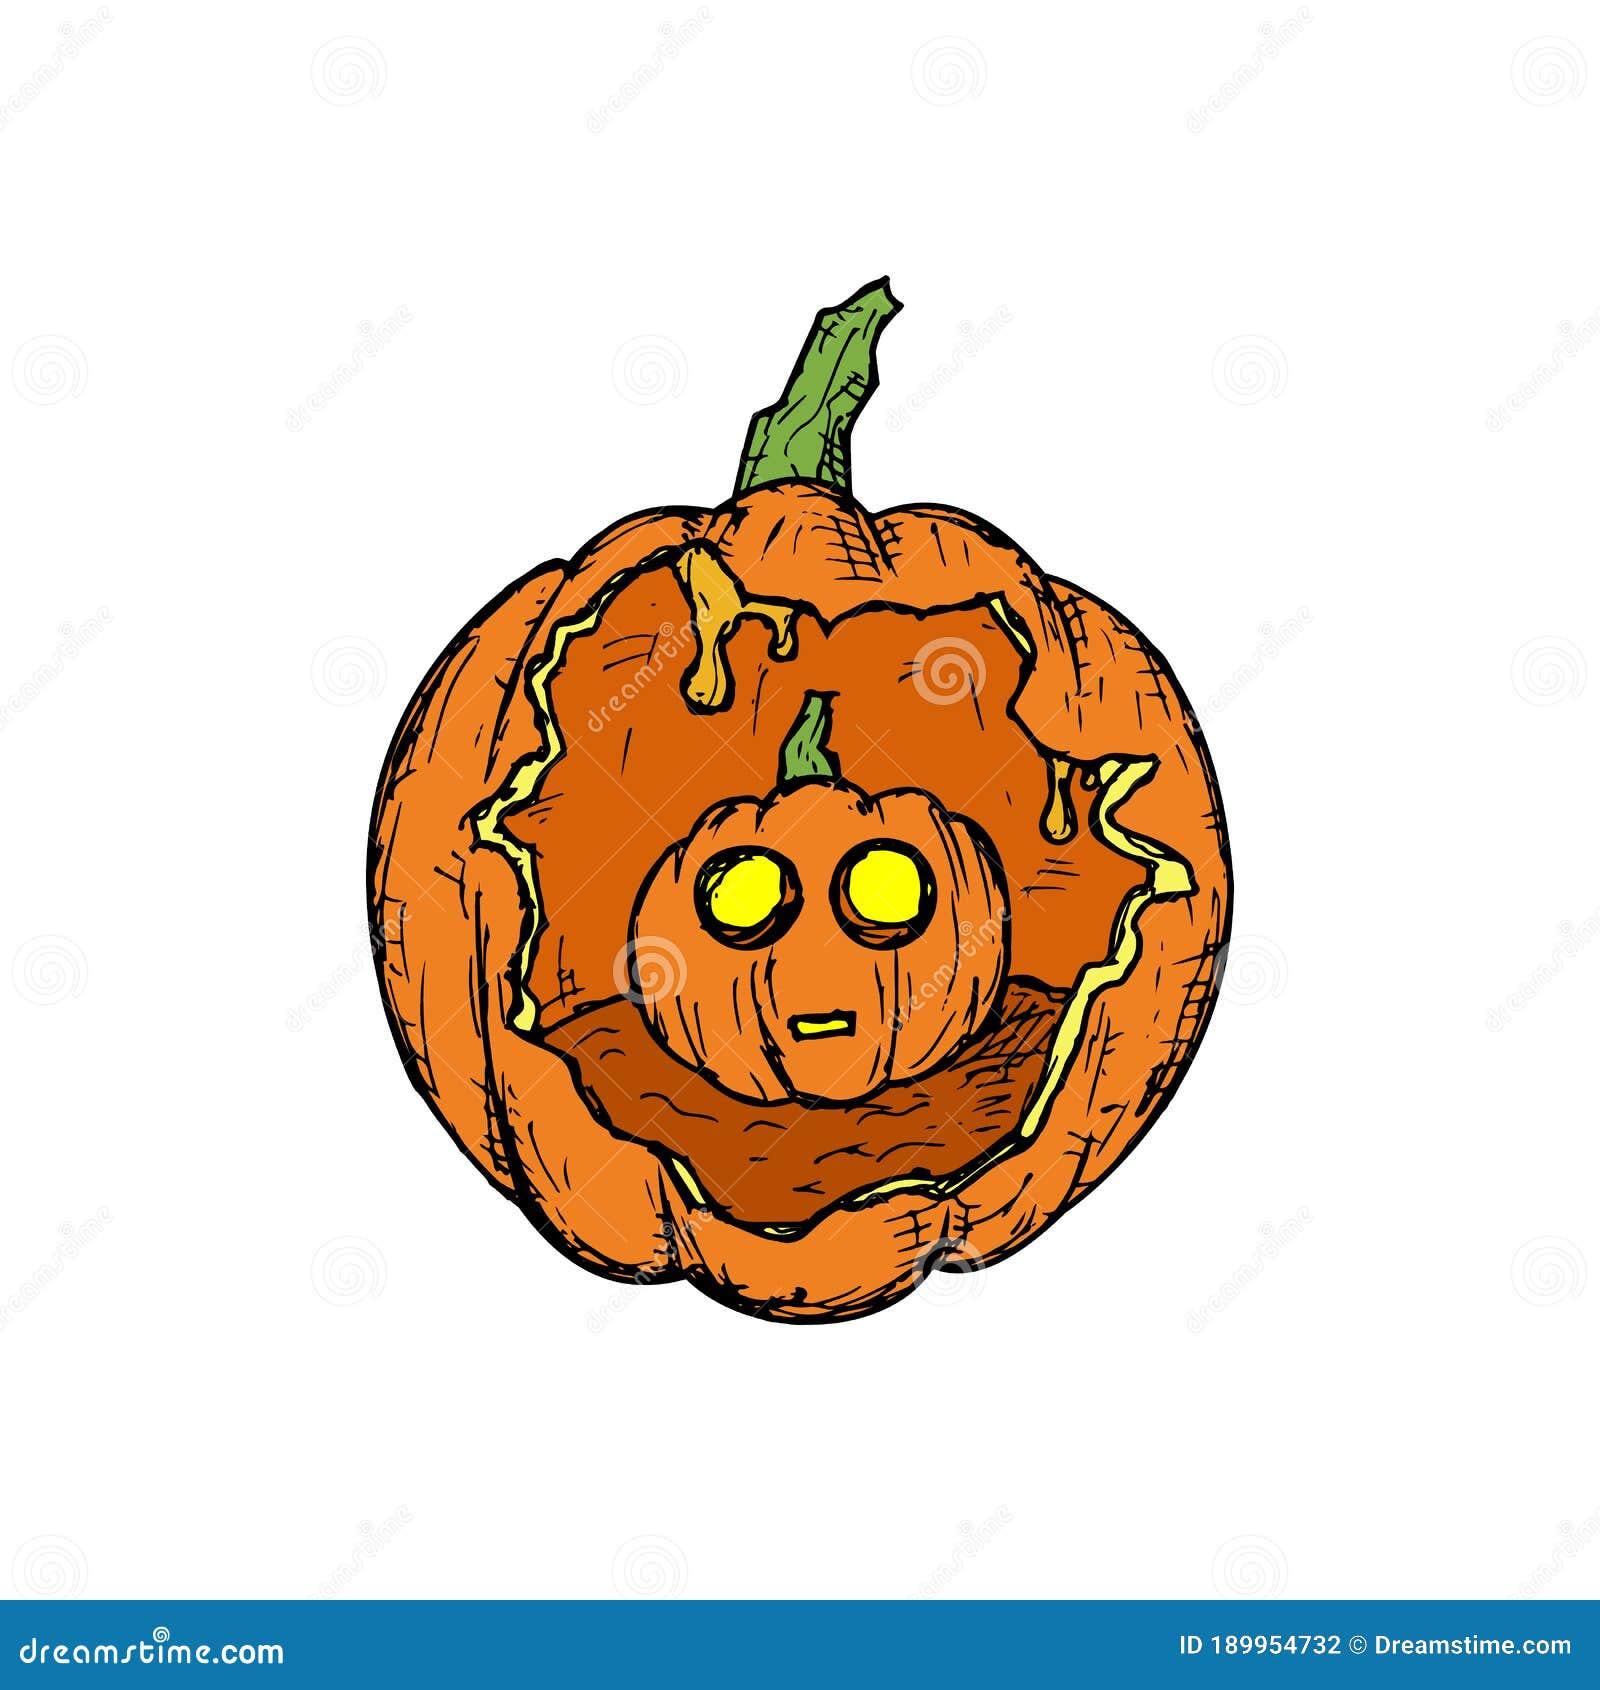 Pumpkin With A Small Halloween Pumpkin Inside Jack O Lantern Stock Vector Illustration Of Evil Horror 189954732